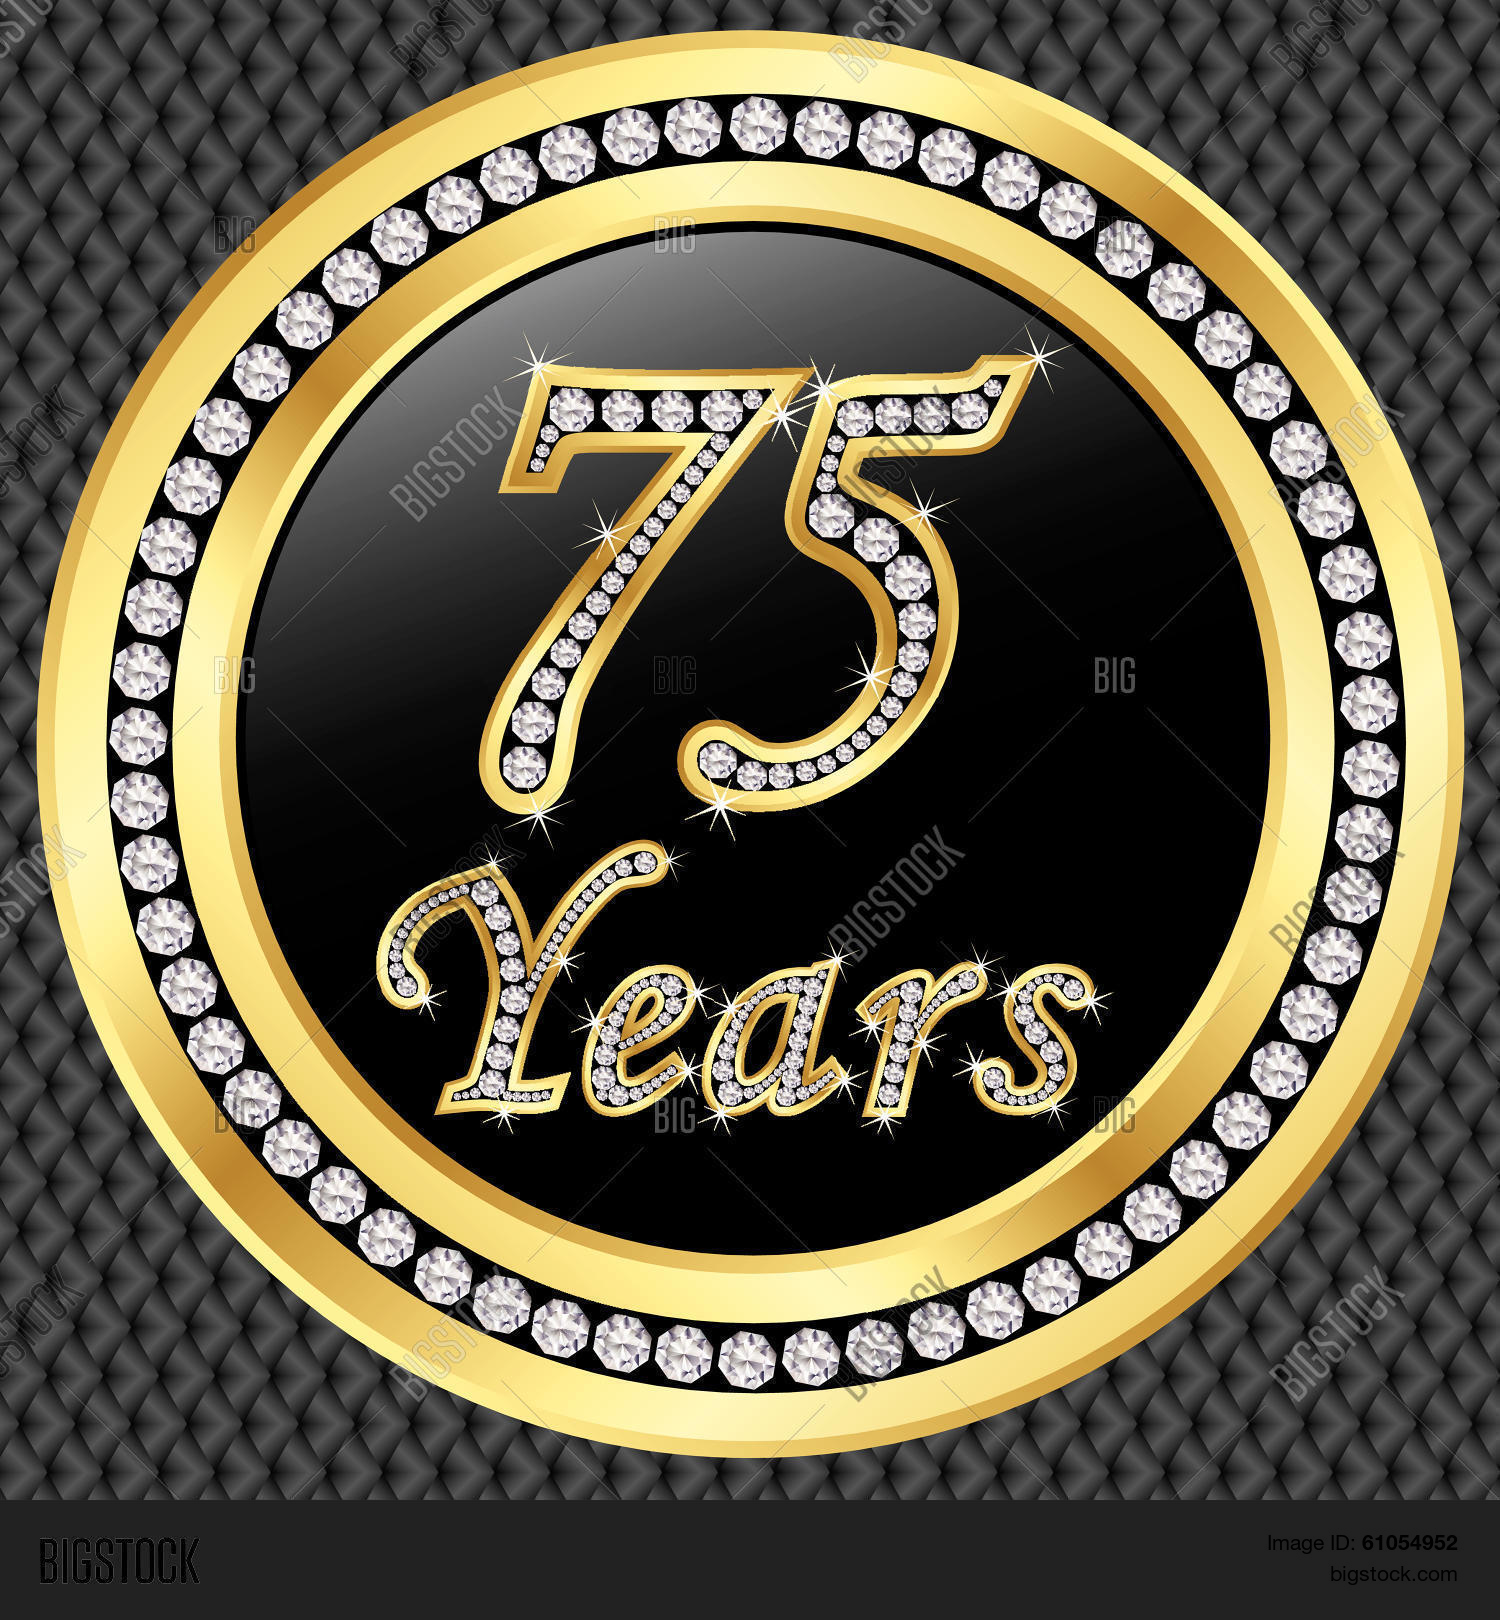 75 years anniversary vector photo free trial bigstock